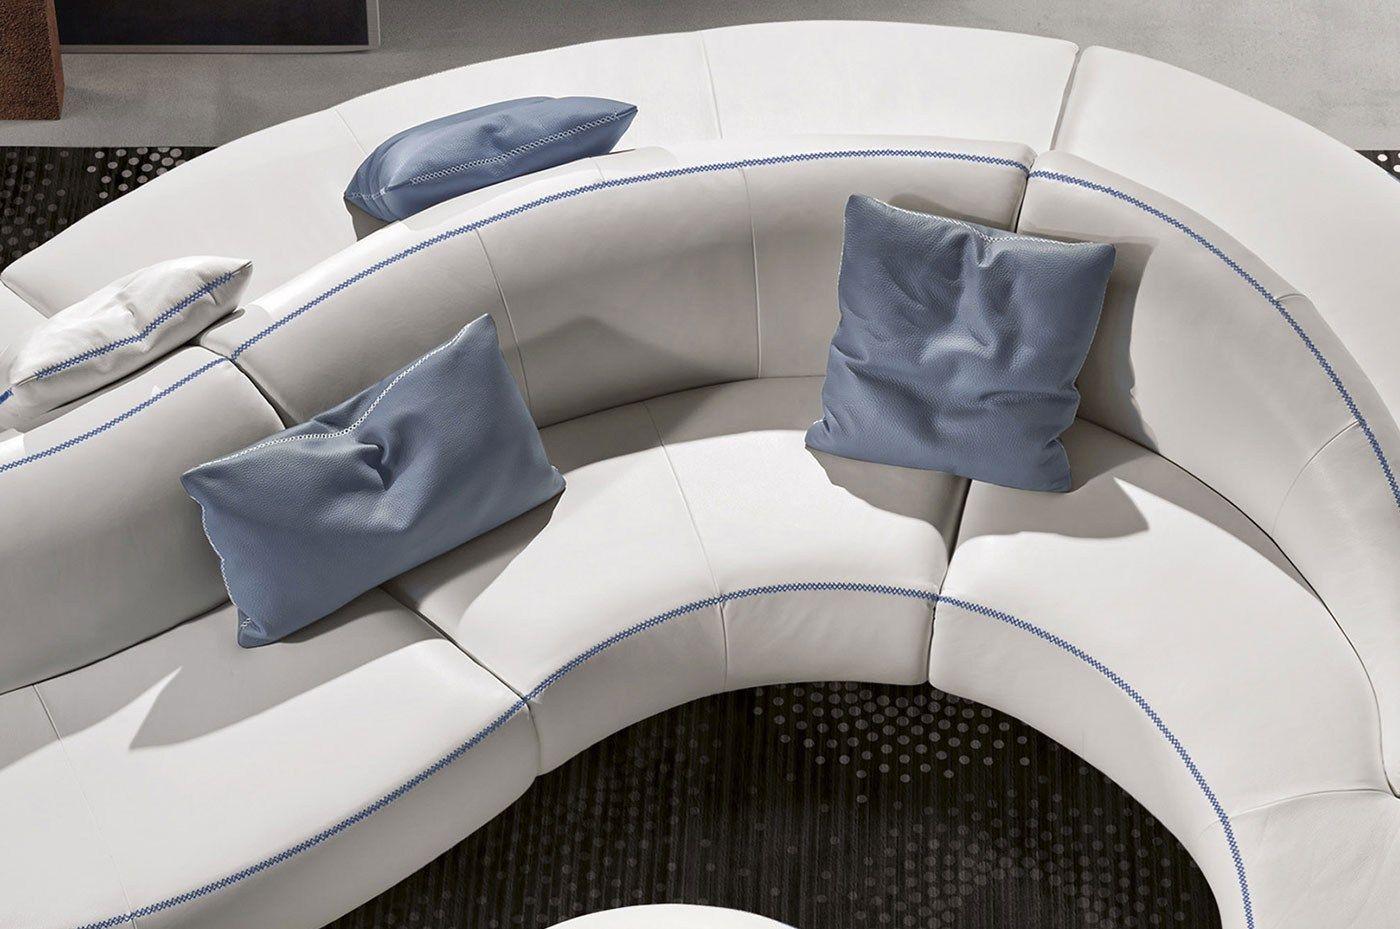 Onda divano rotondo by italy dream design kallist for Divano rotondo